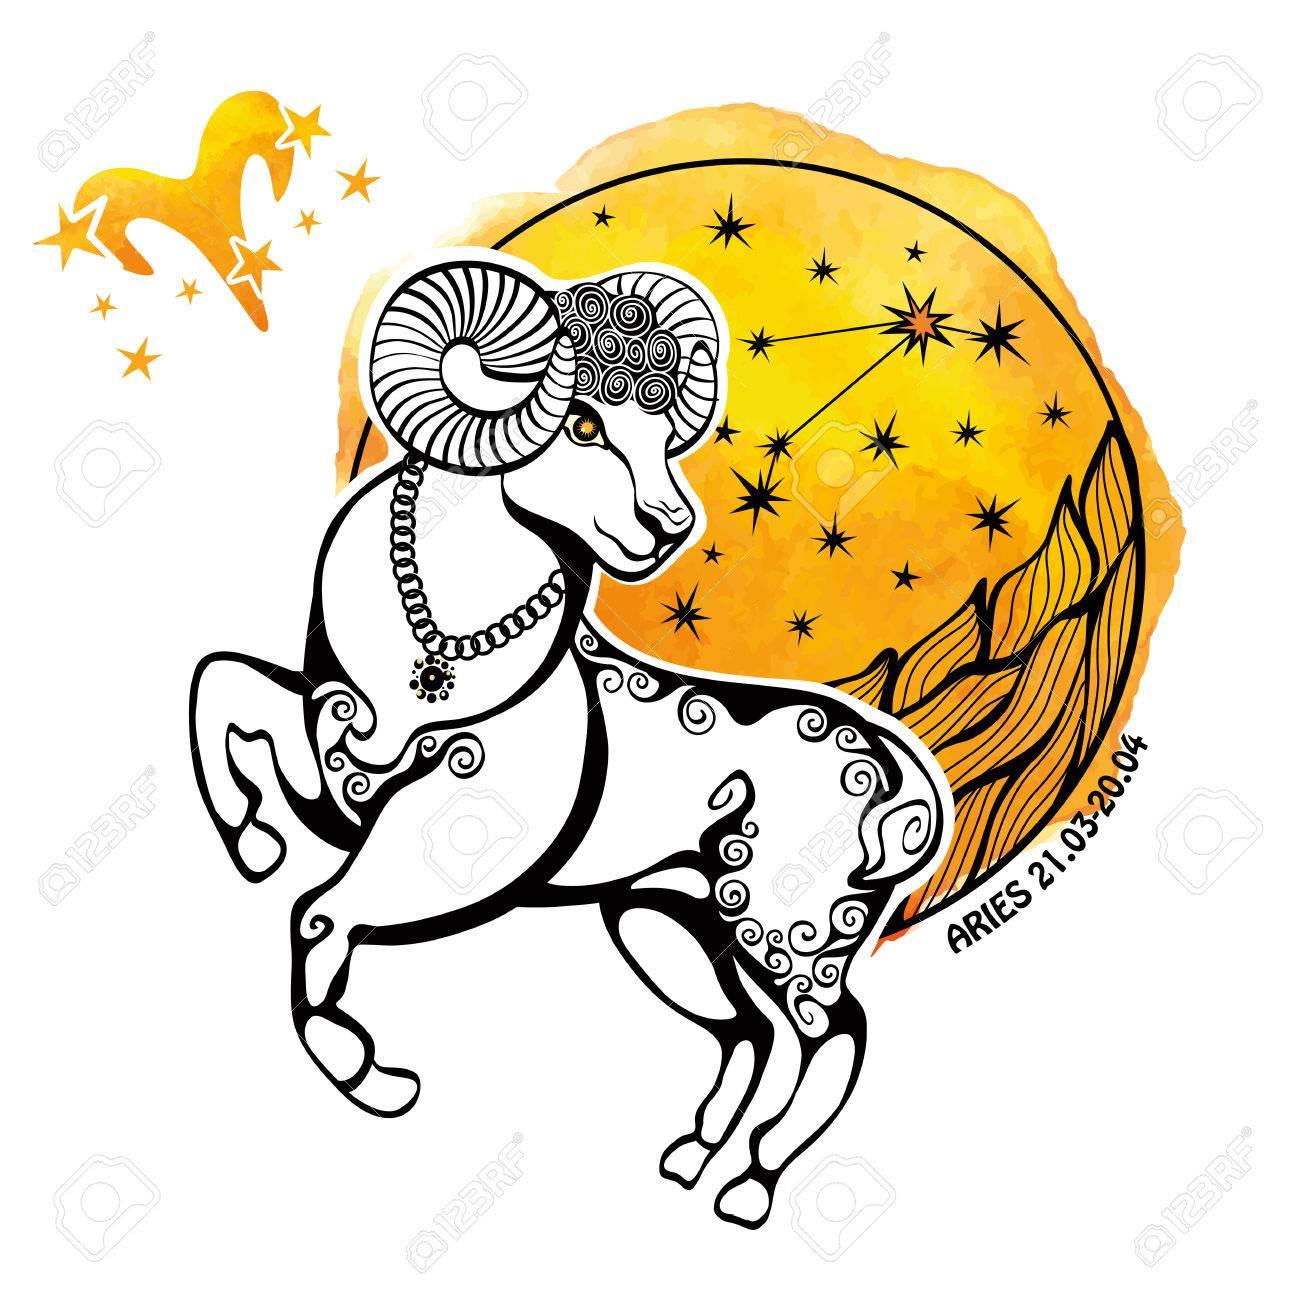 Aries Zodiac Sign Horoscope Constellationstars In Circle